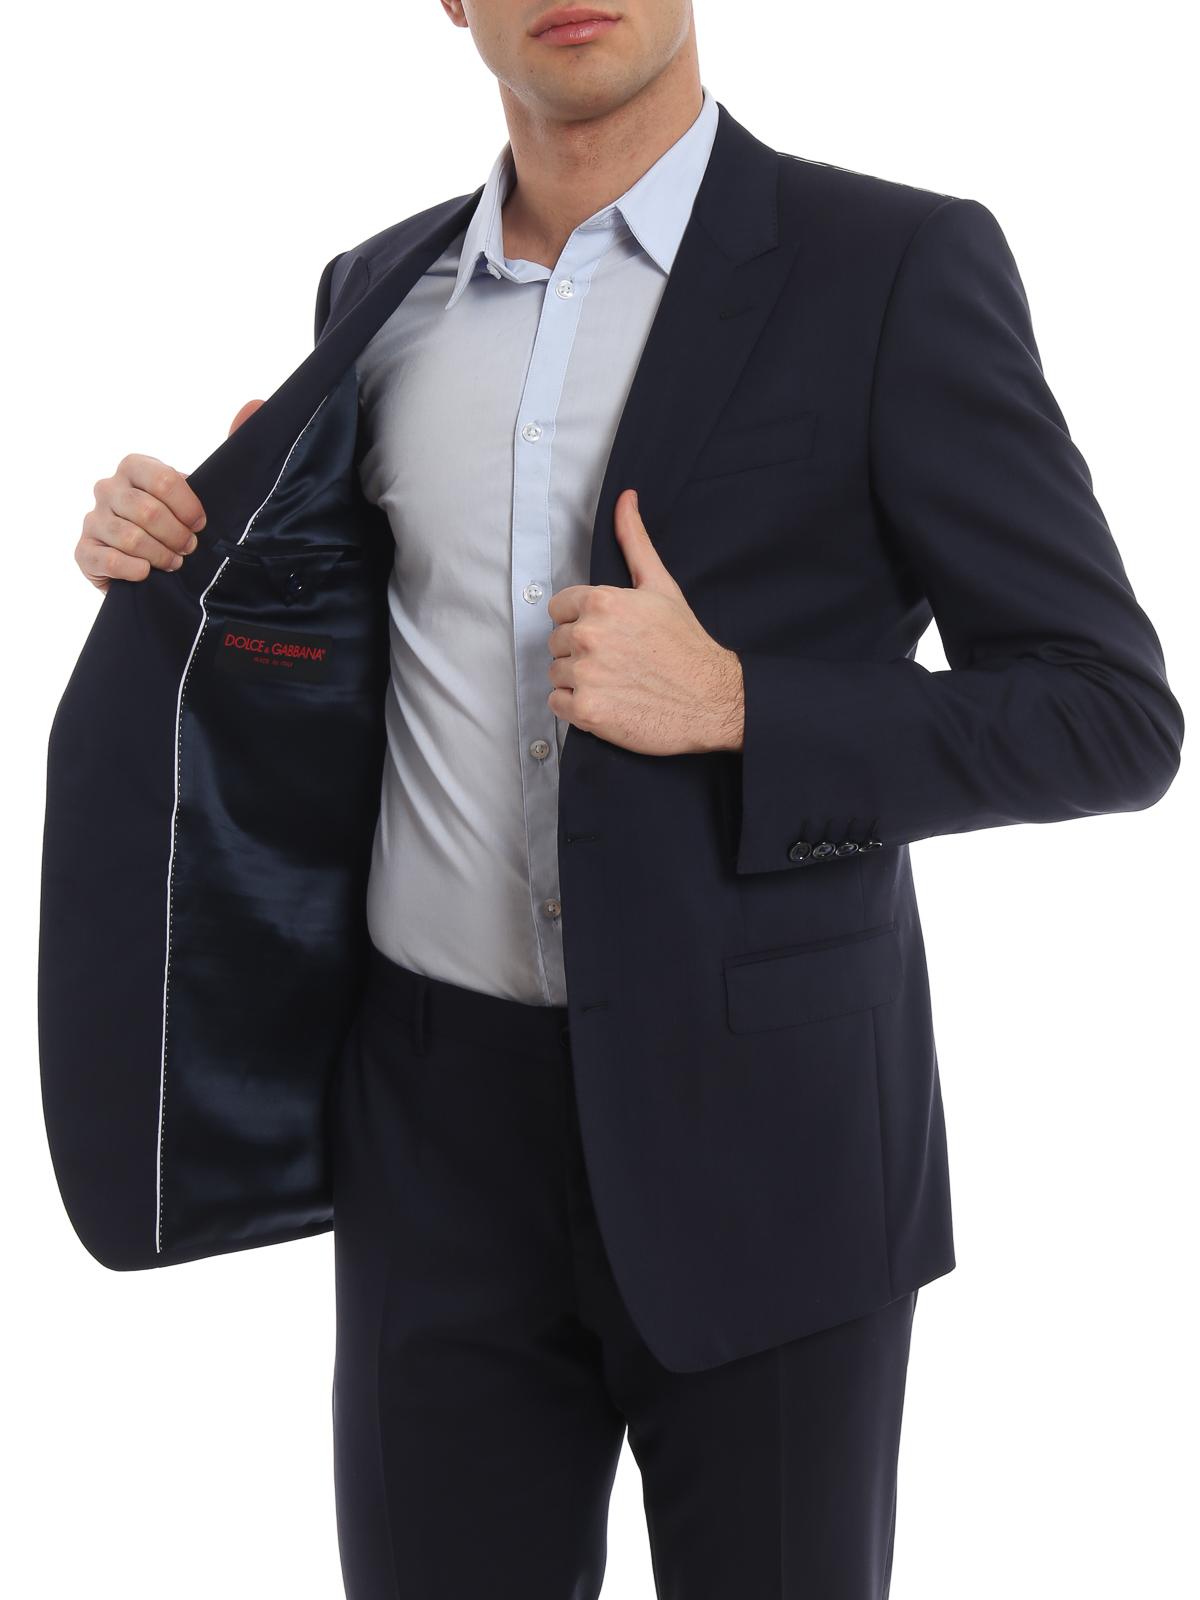 new product 2f7e5 0756f Dolce & Gabbana - Eleganter Anzug - Dunkelblau - Elegante ...